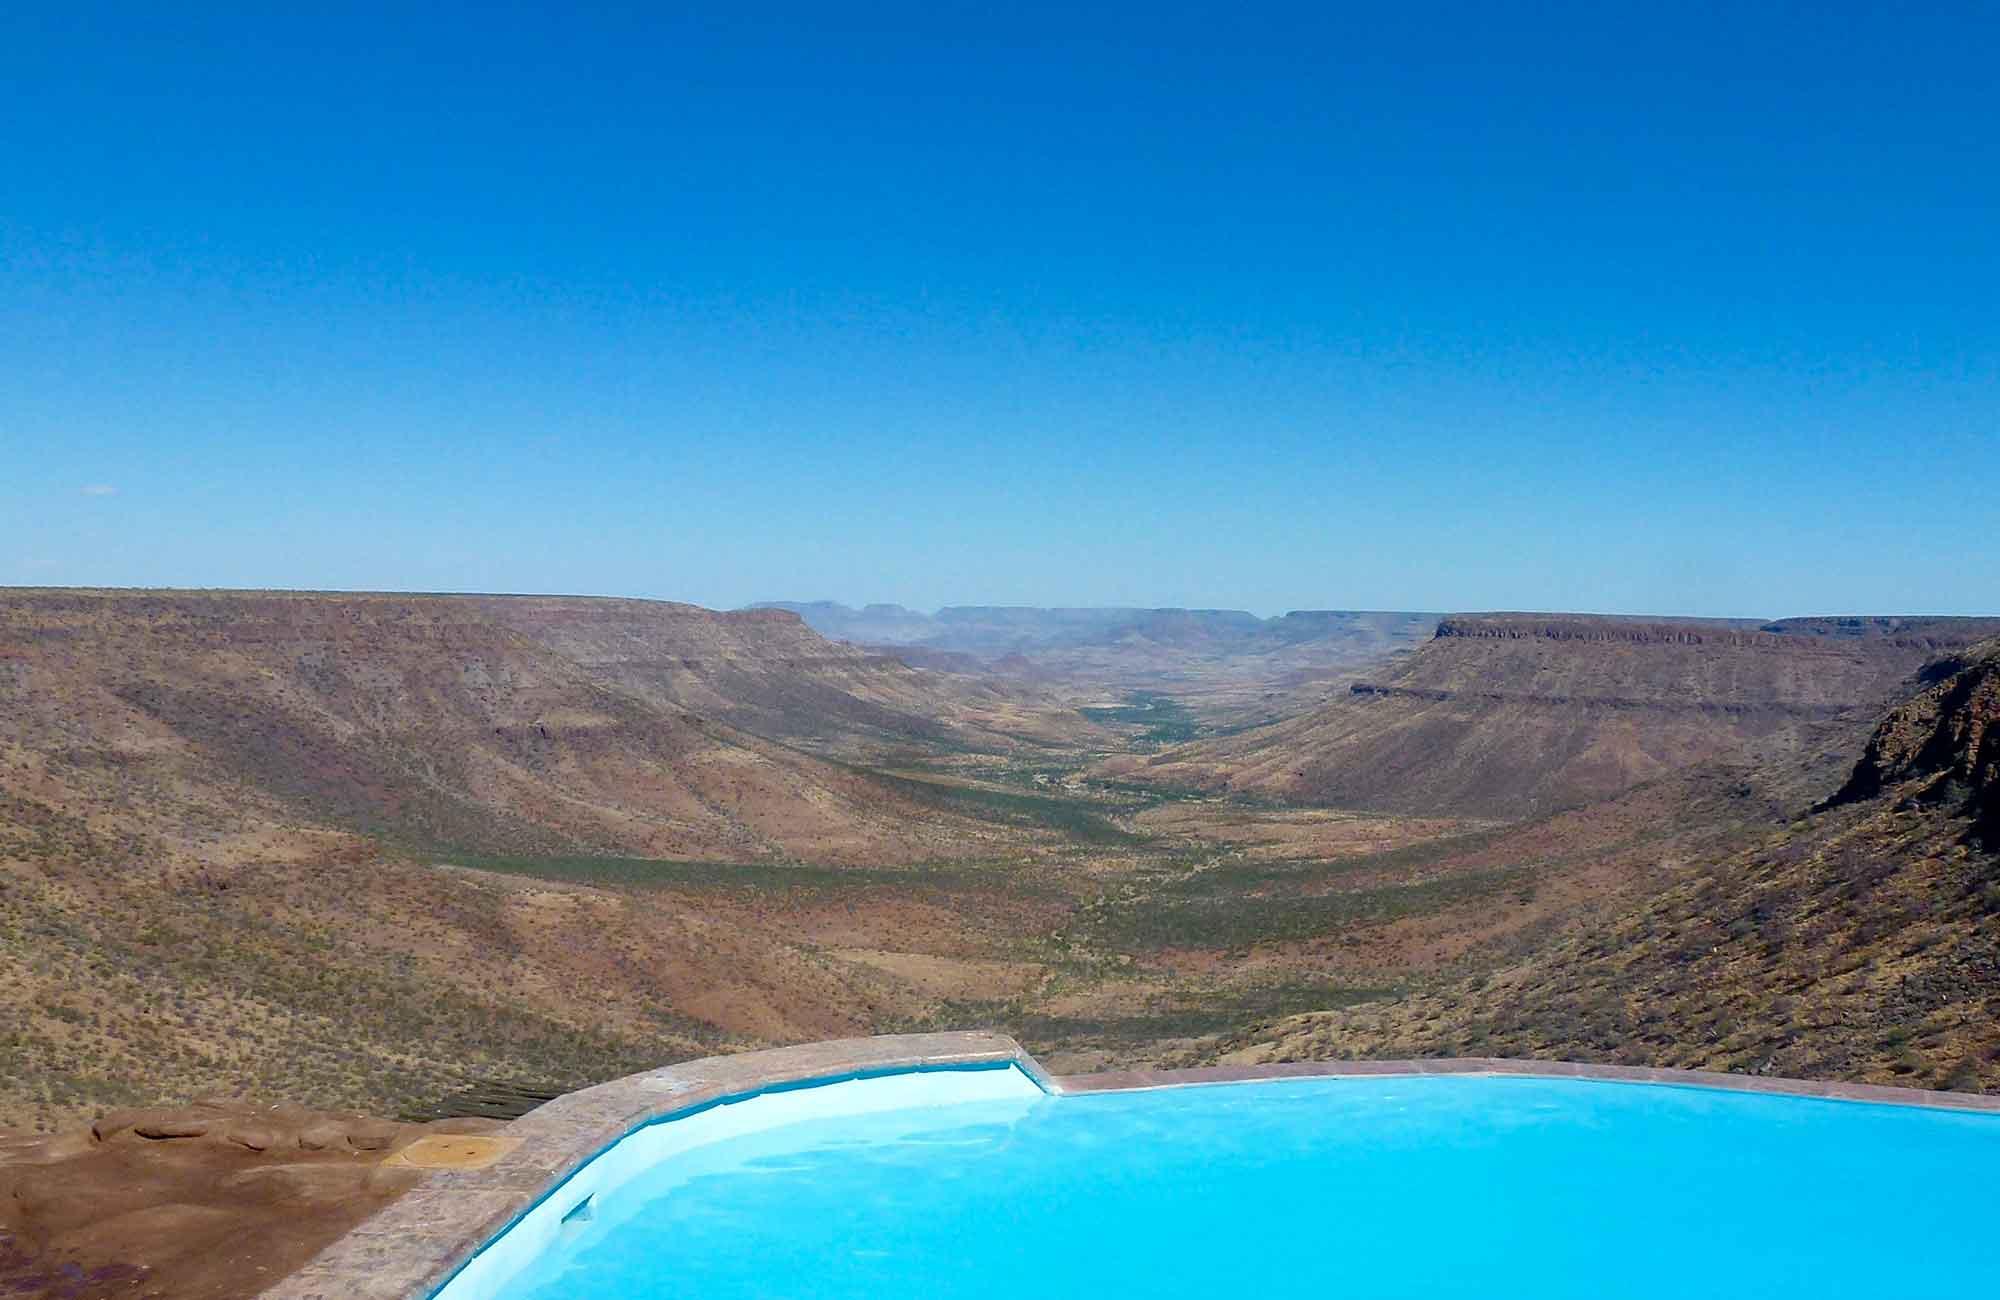 Voyage Namibie - Damaraland - Amplitudes